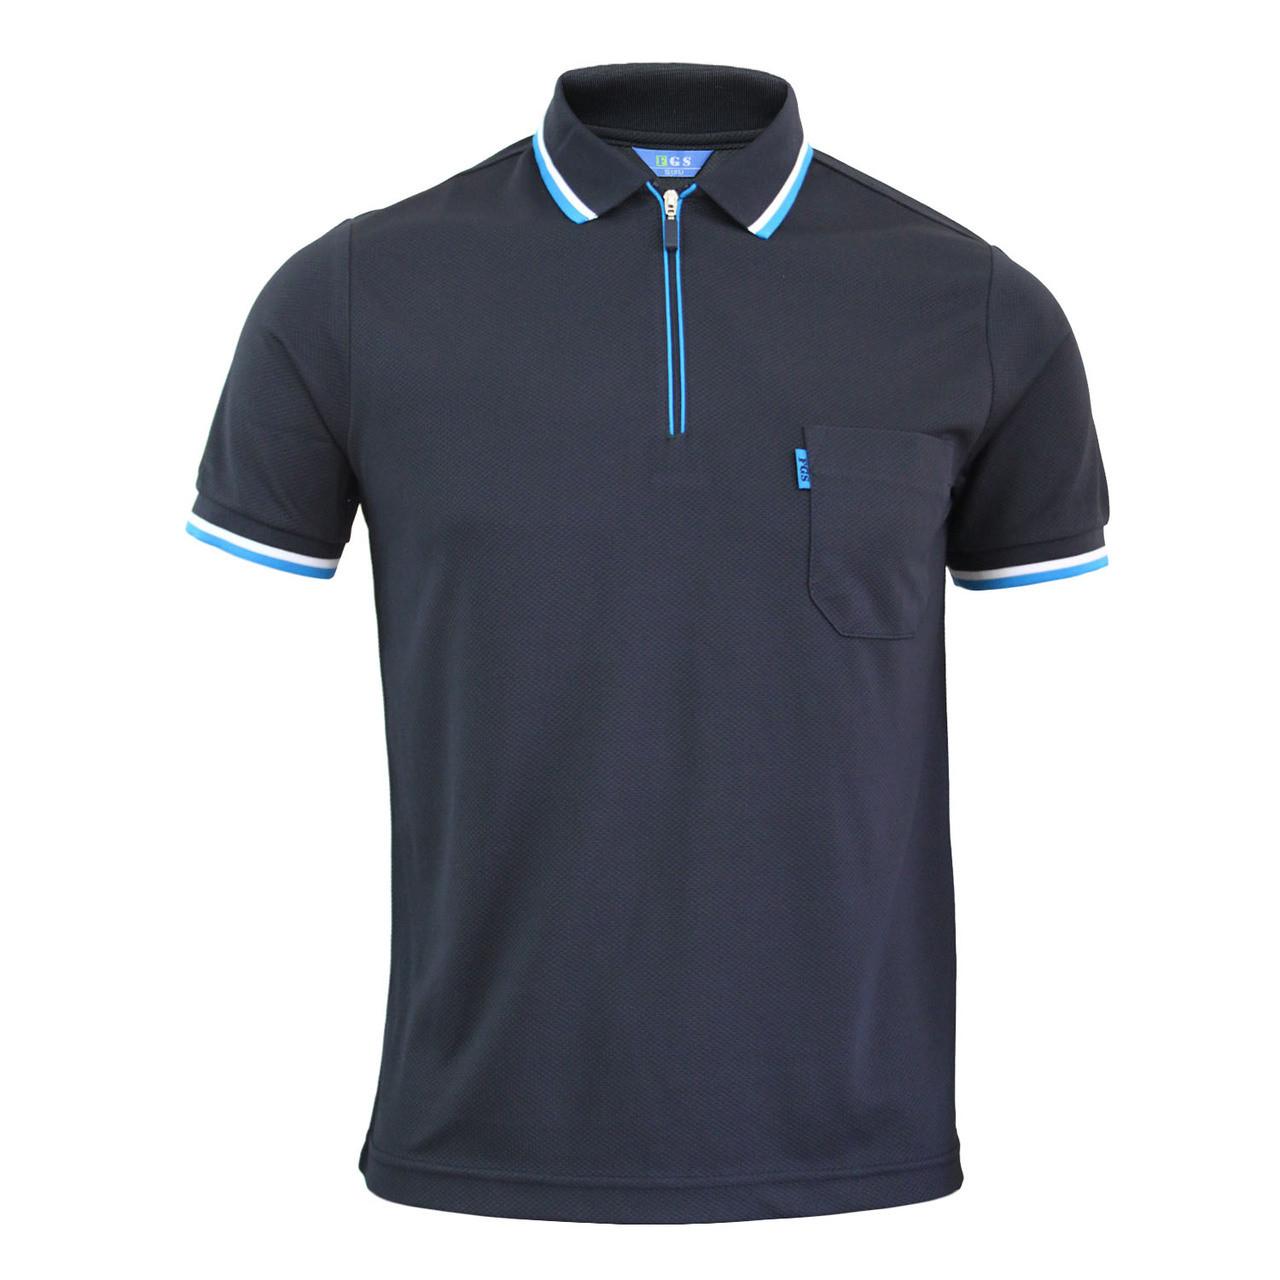 BCPOLO Zip Polo Shirt Athletic Long Sleeve Dri Fit Zip Polo-Sky-Blue-L Asia-2XL